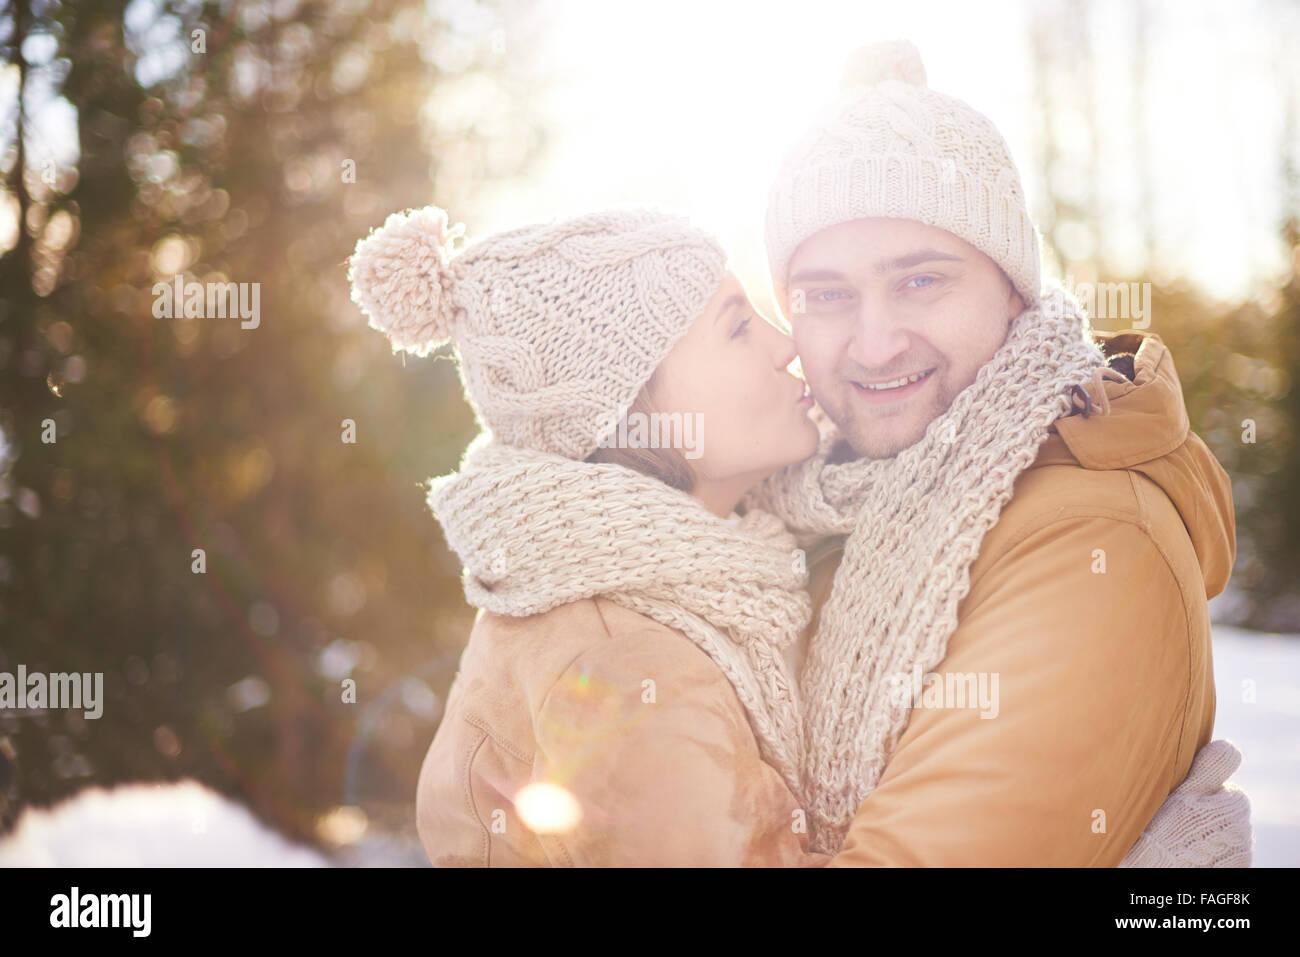 Junge Frau gibt ihrem Mann zärtlich küssen Stockbild